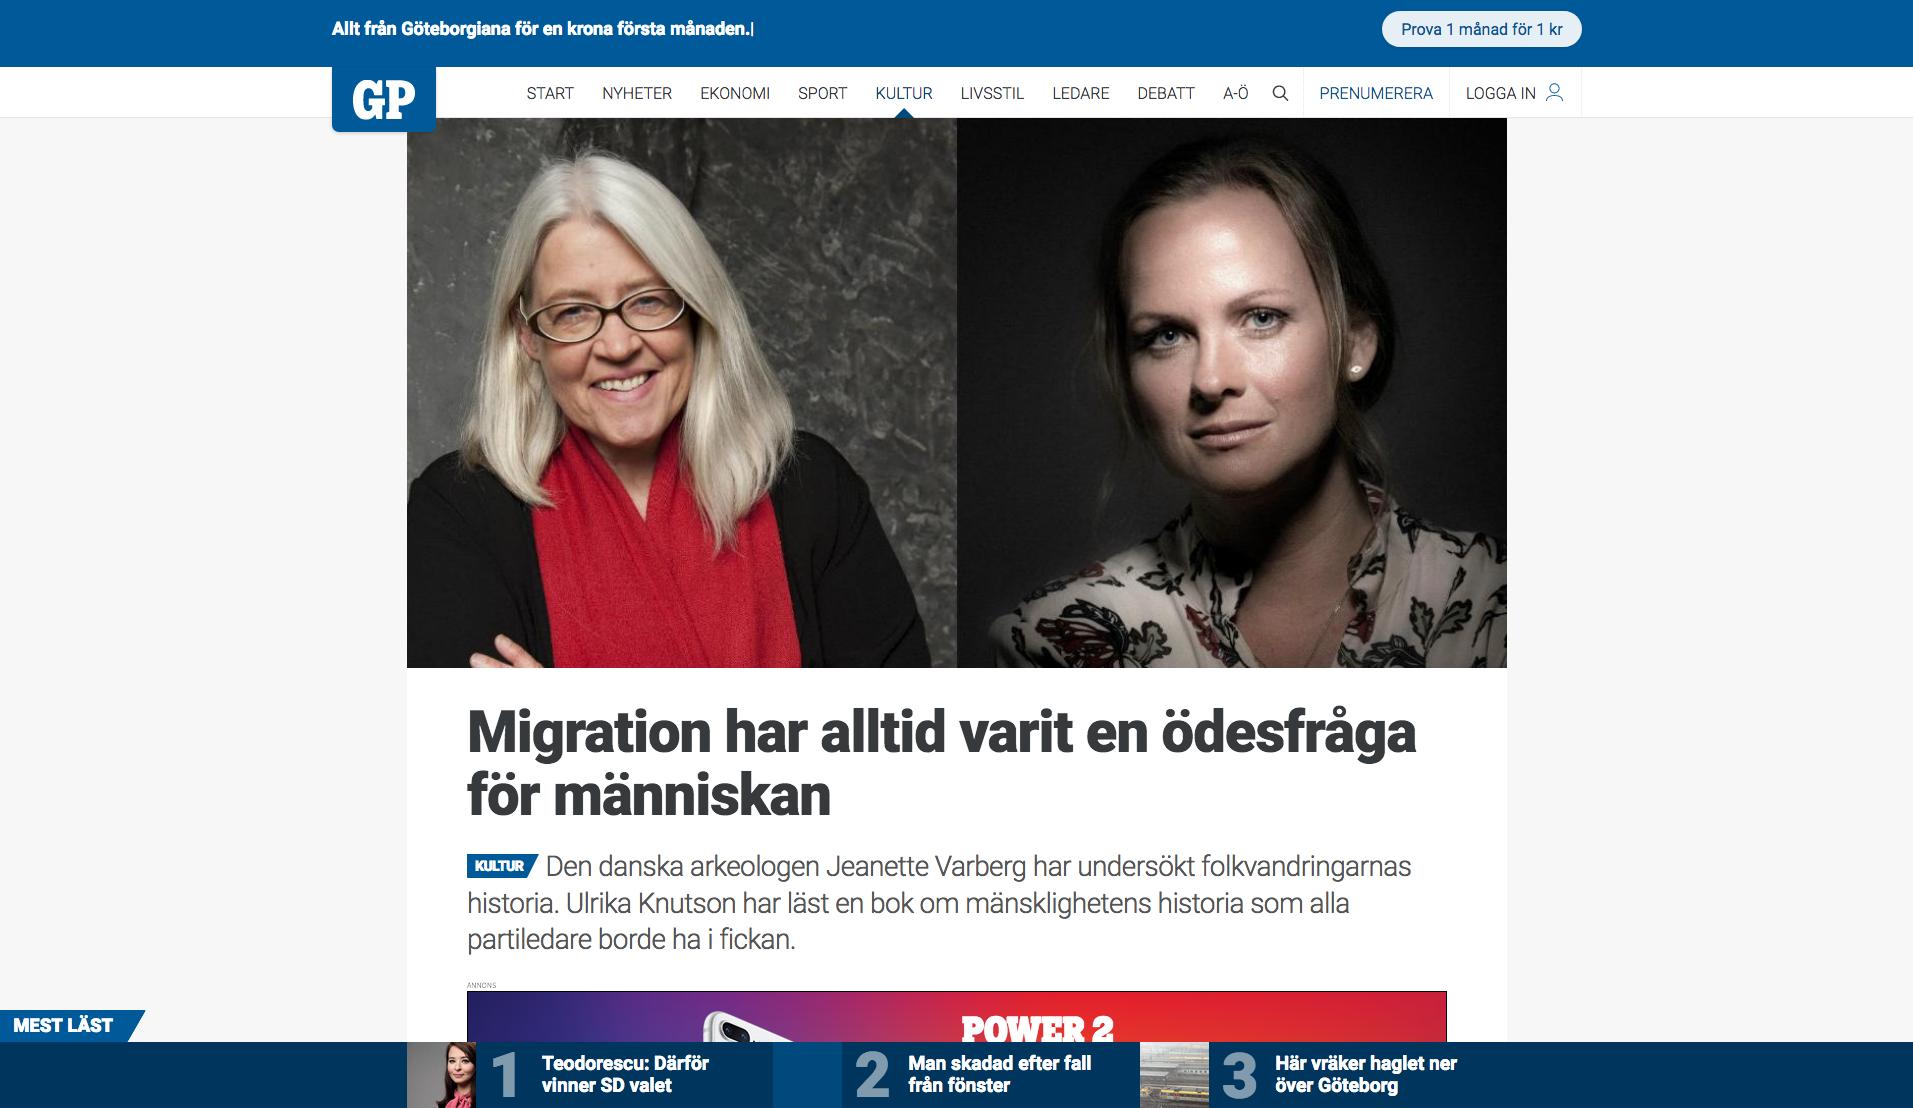 JeanetteVarberg-Ulrika Knutson-JuanDeDios-VisualStoresDenmark1